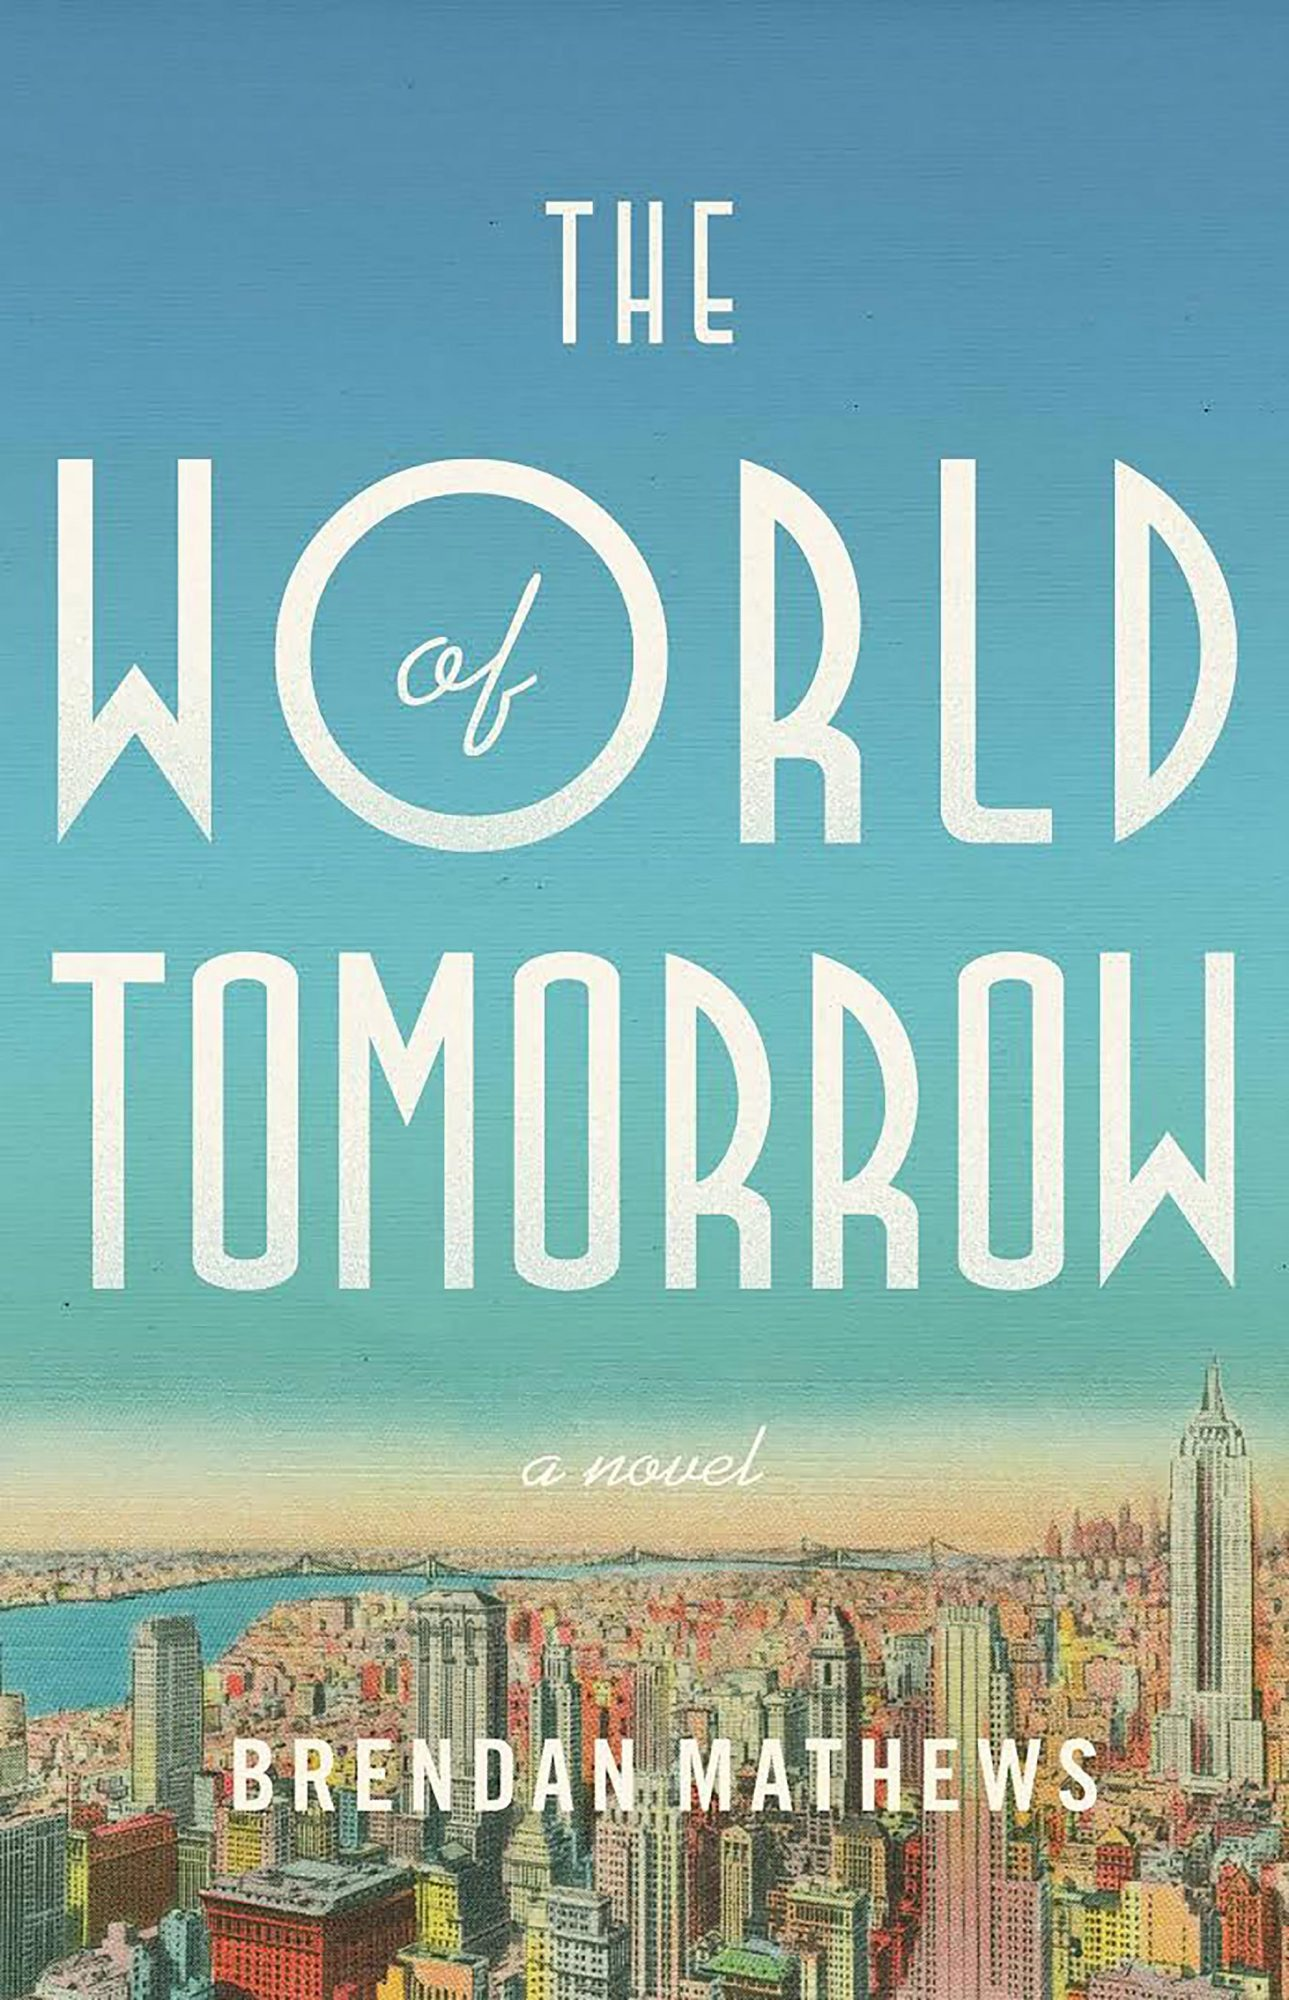 Brendan Mathews, The World of Tomorrow CR: Little, Brown